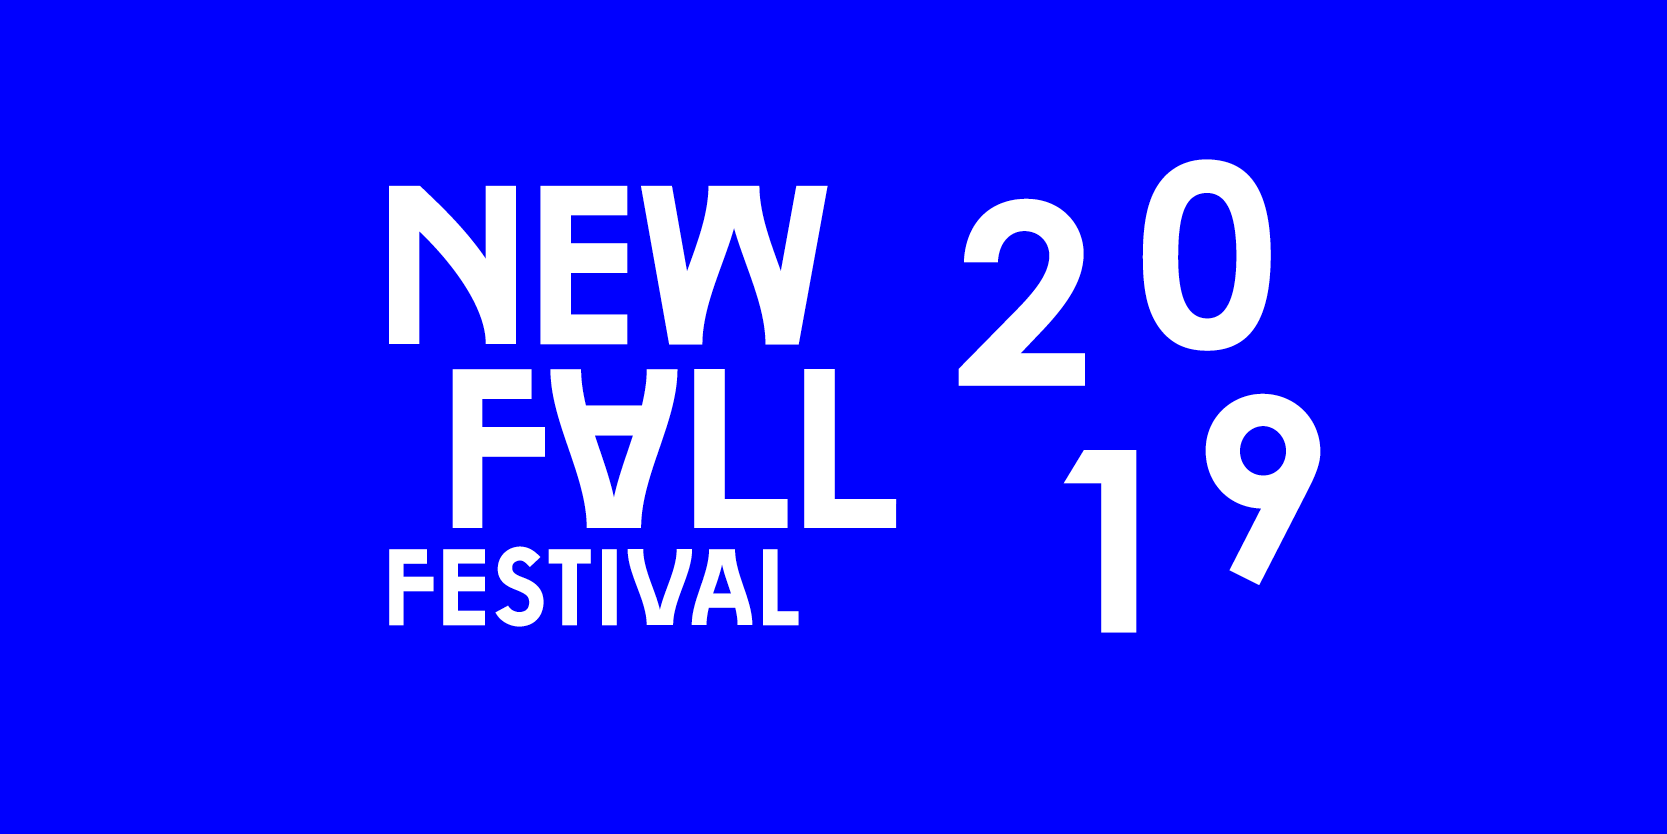 New Fall 2019